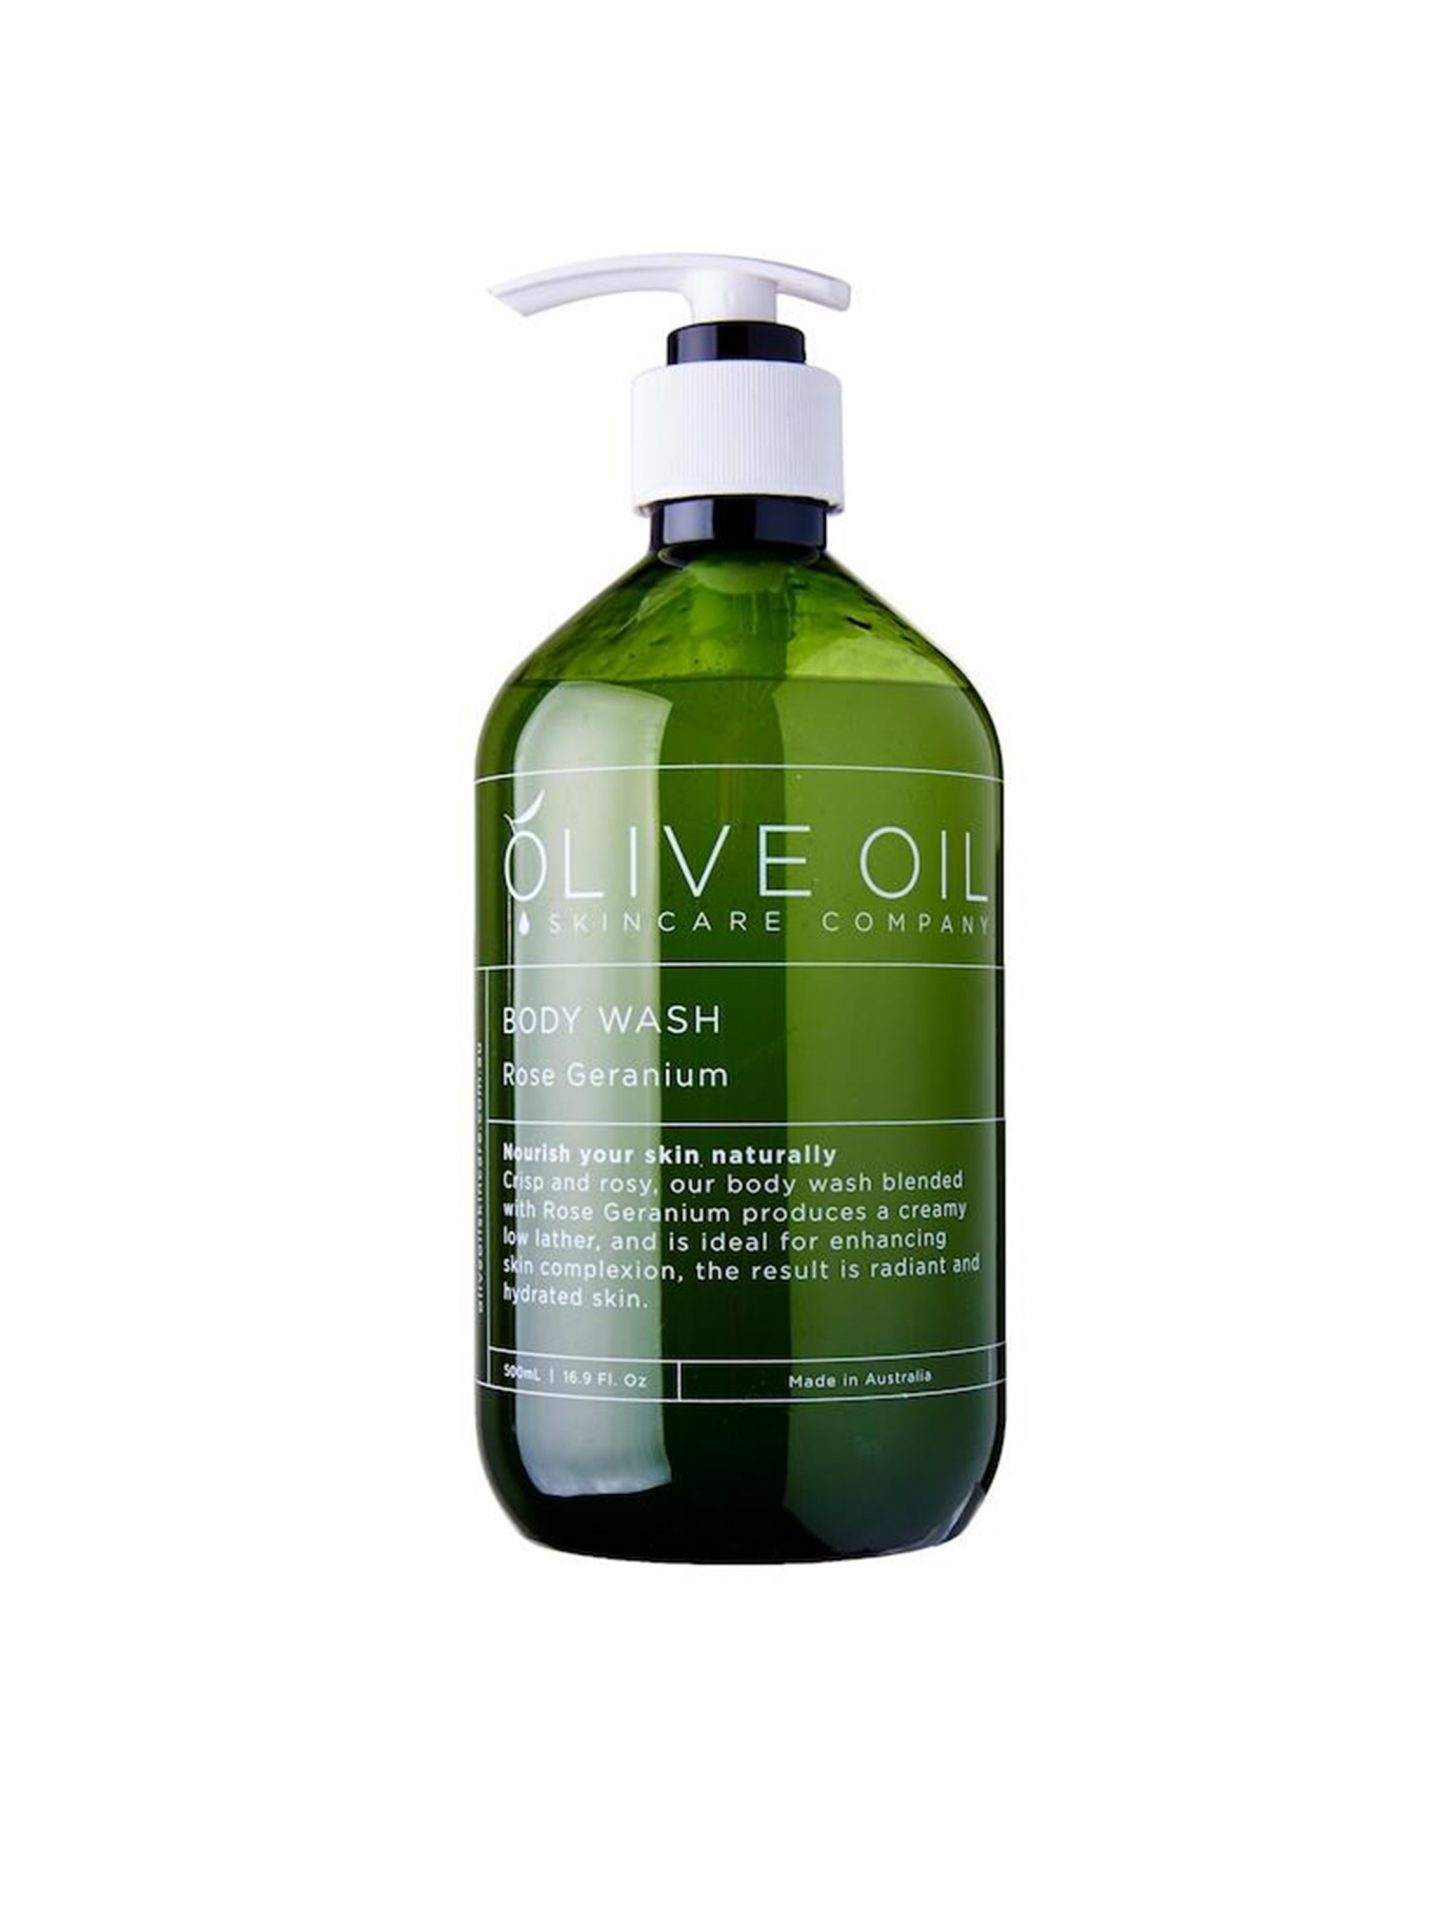 Olive Oil Body Wash